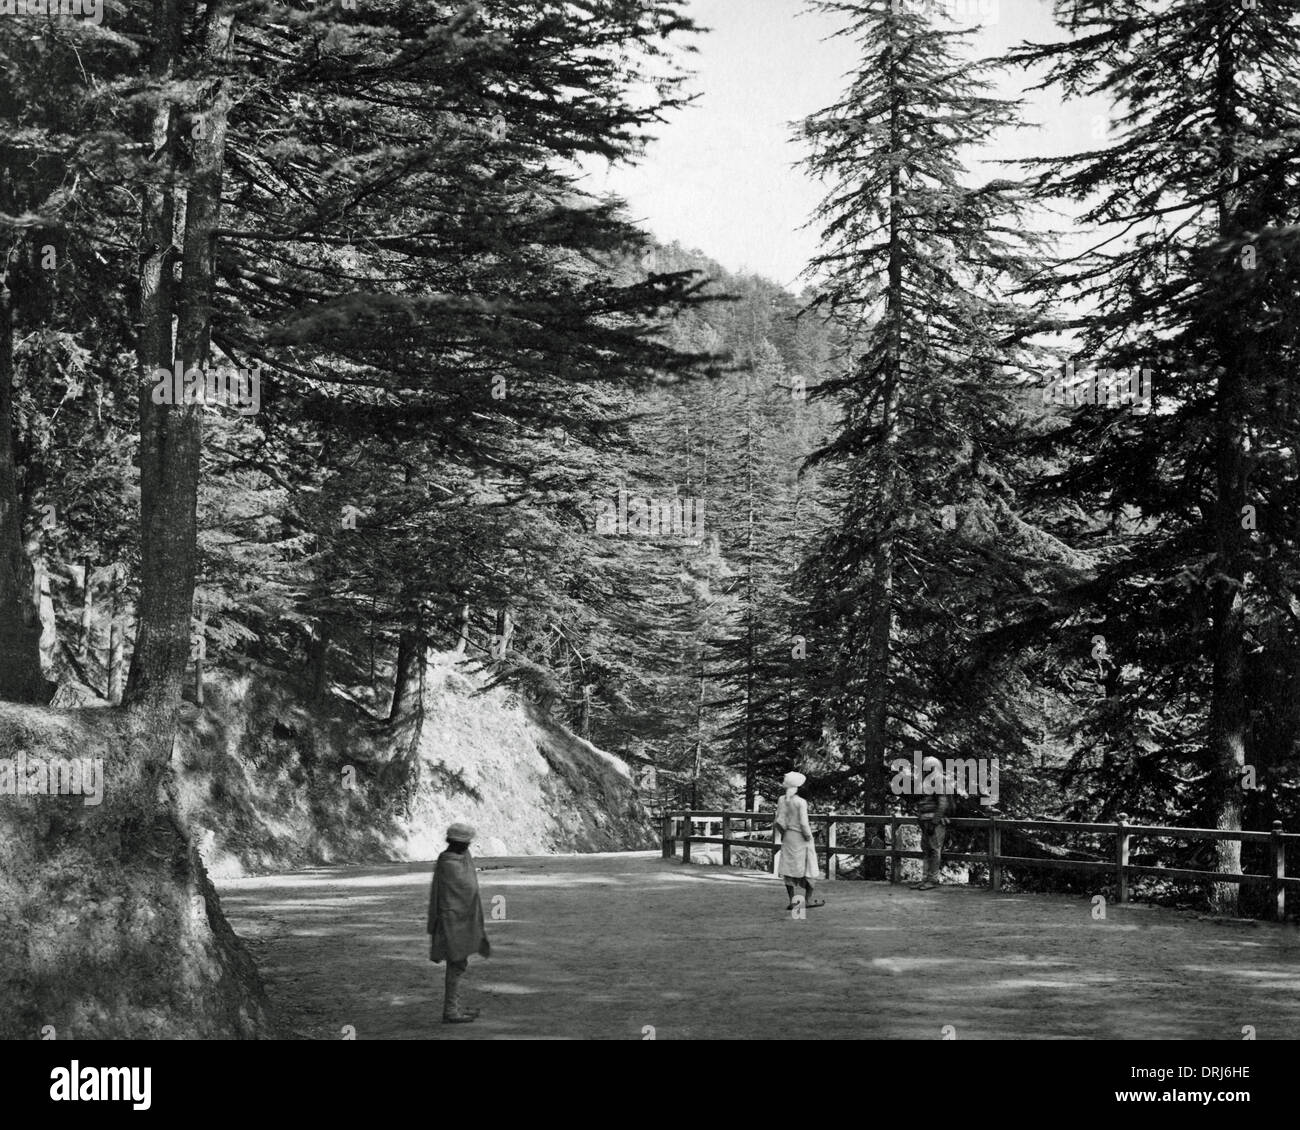 Mall Road, Simla (Shimla), India - Stock Image